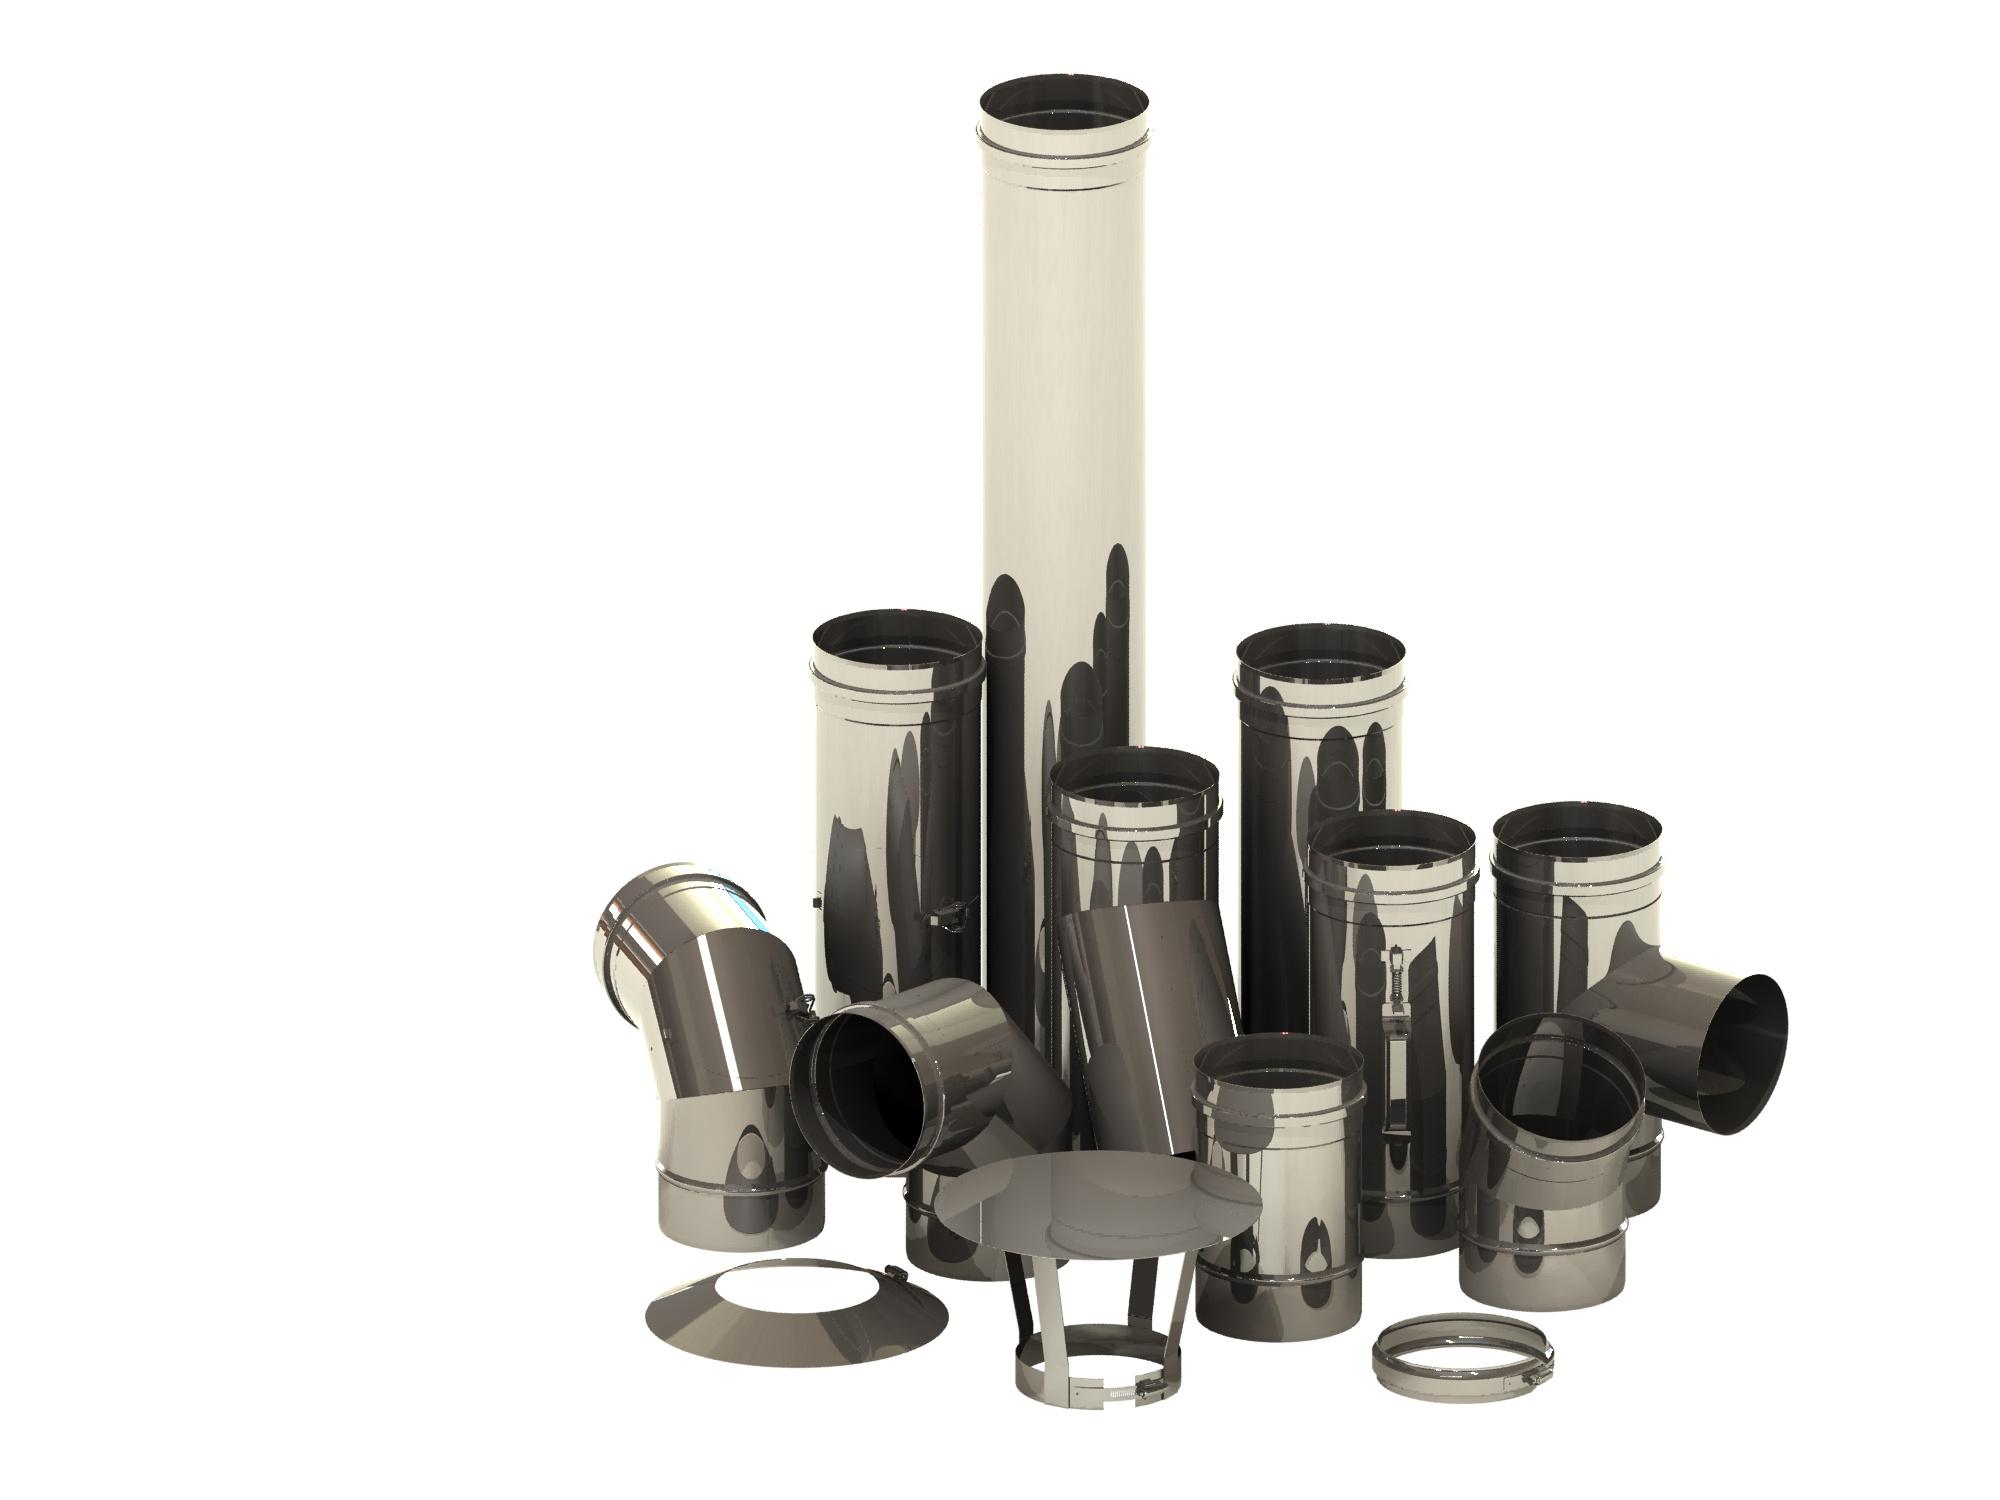 Schornsteinsanierung einwandig Ø 130 mm – Tecnovis TEC-EW-Classic